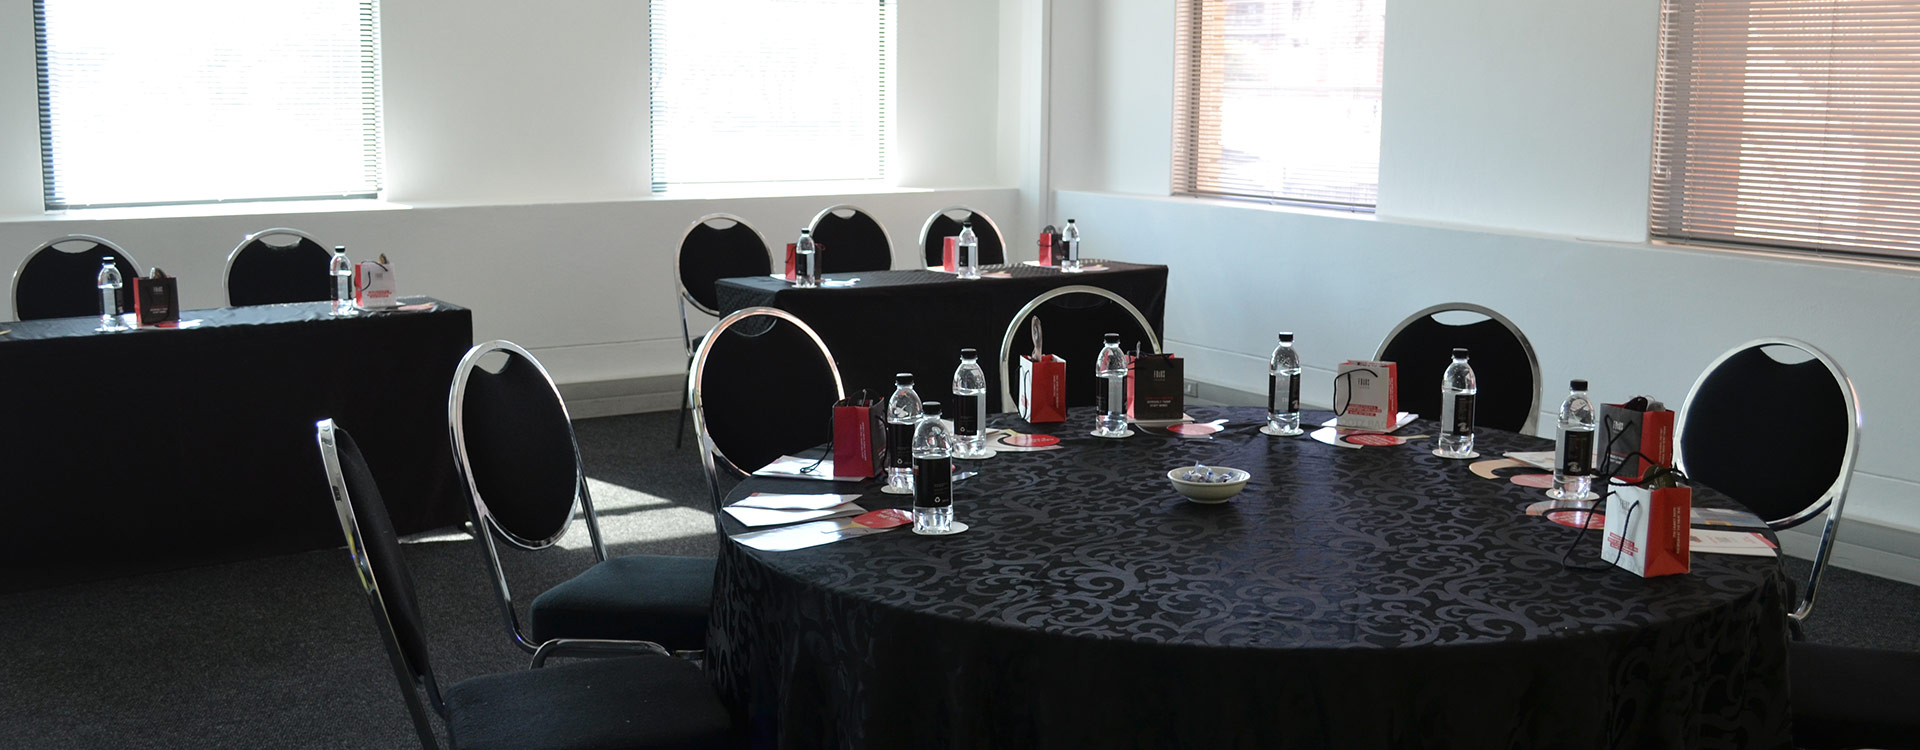 Sputnik Room - A Break-Away Events Venue   Focus Rooms